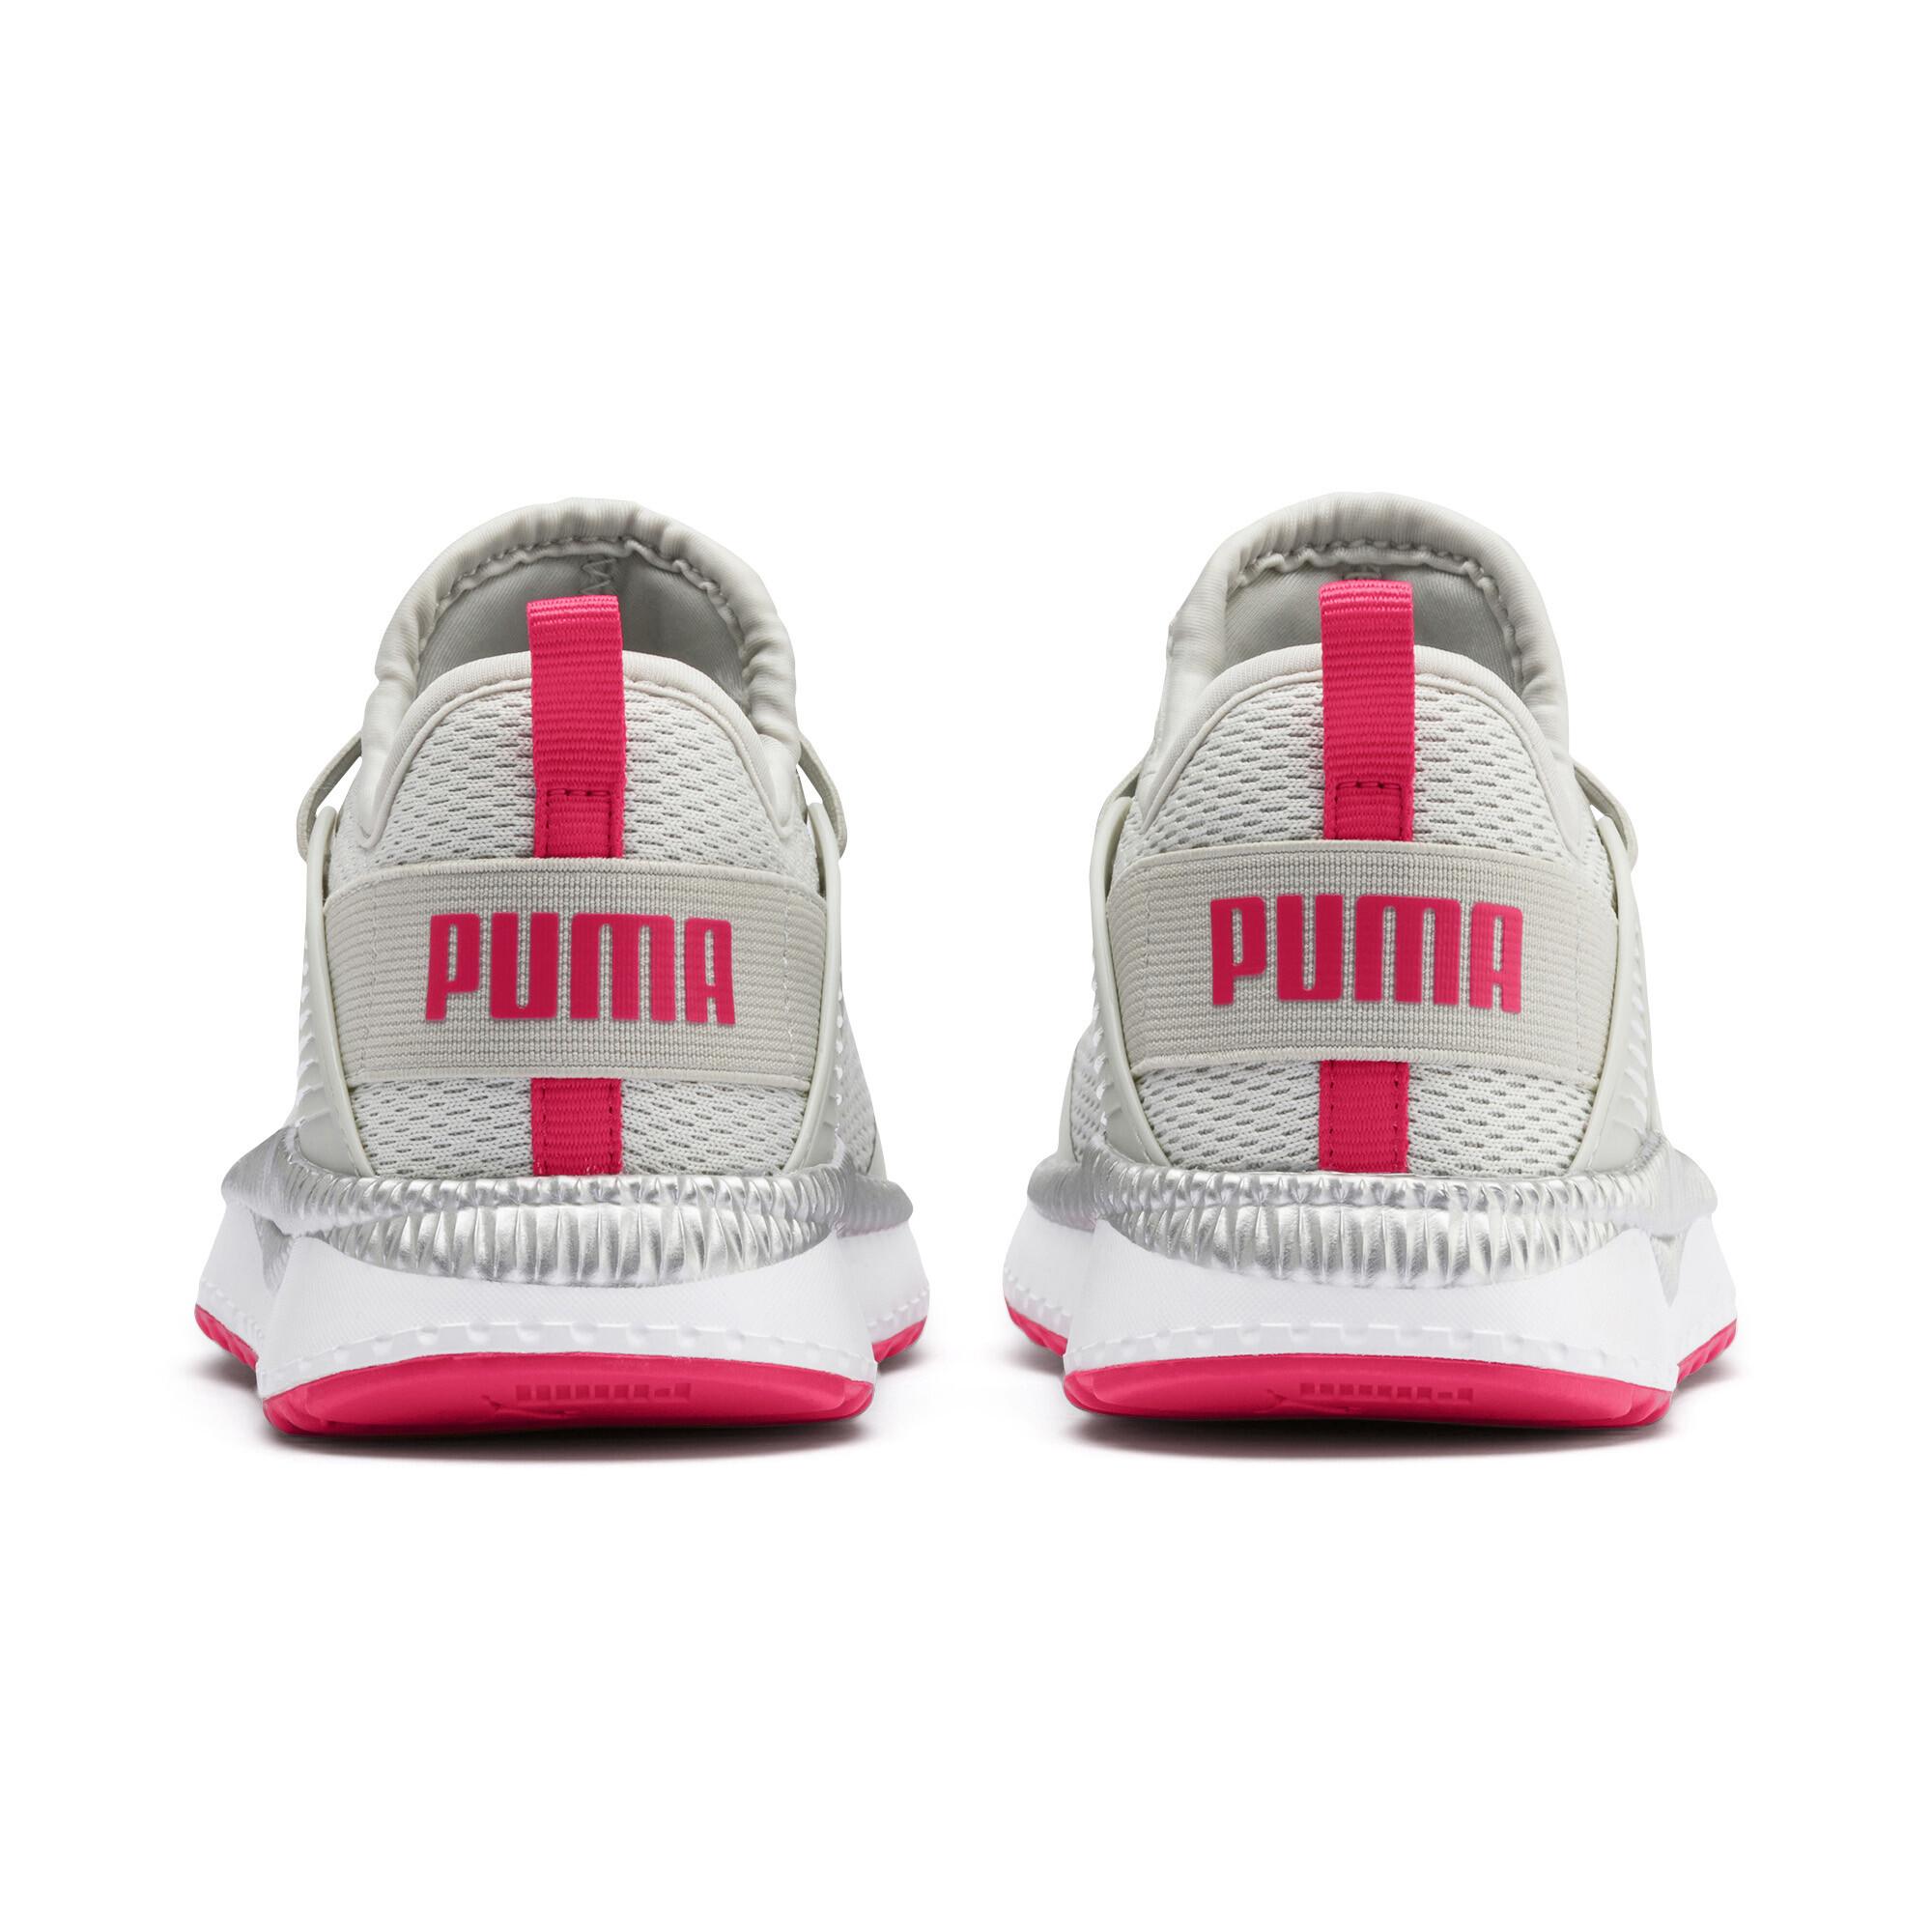 PUMA-Pacer-Next-Cage-Metallic-Little-Kids-039-Shoes-Girls-Shoe-Kids thumbnail 3